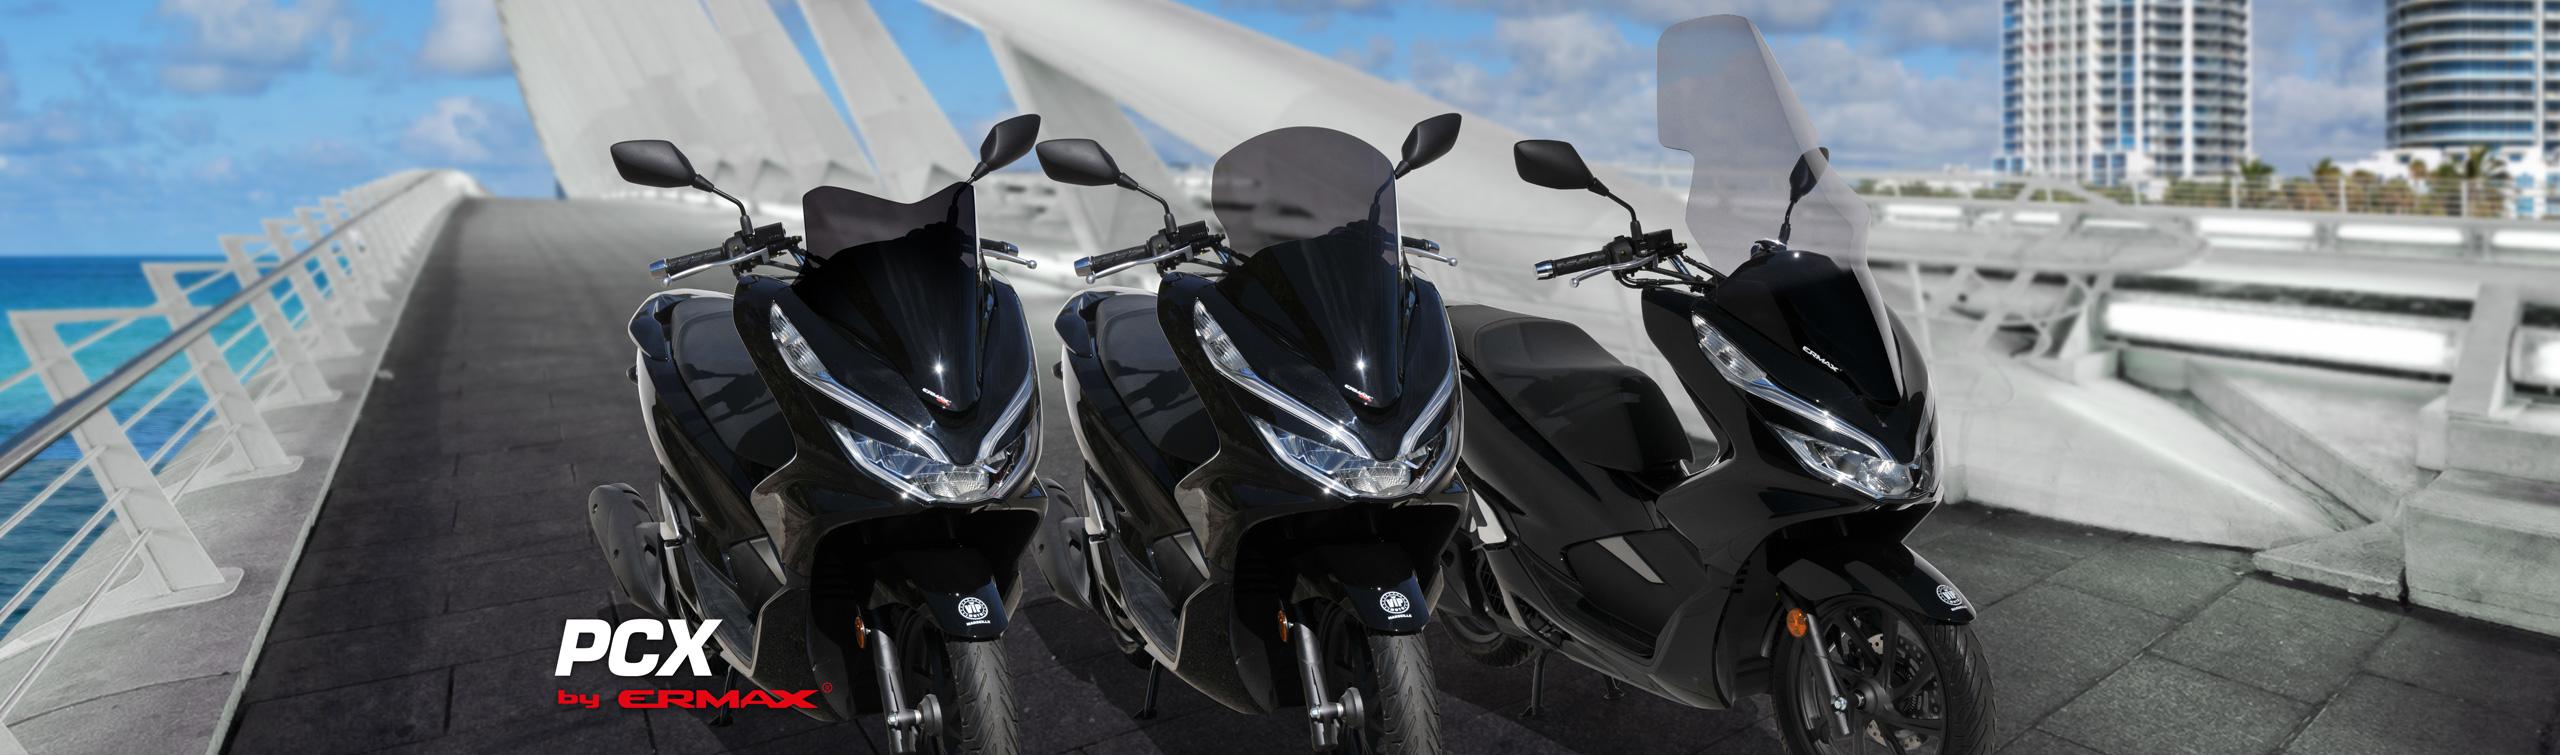 Ermax Home Visor Kawasaki Ninja 150 Rr New